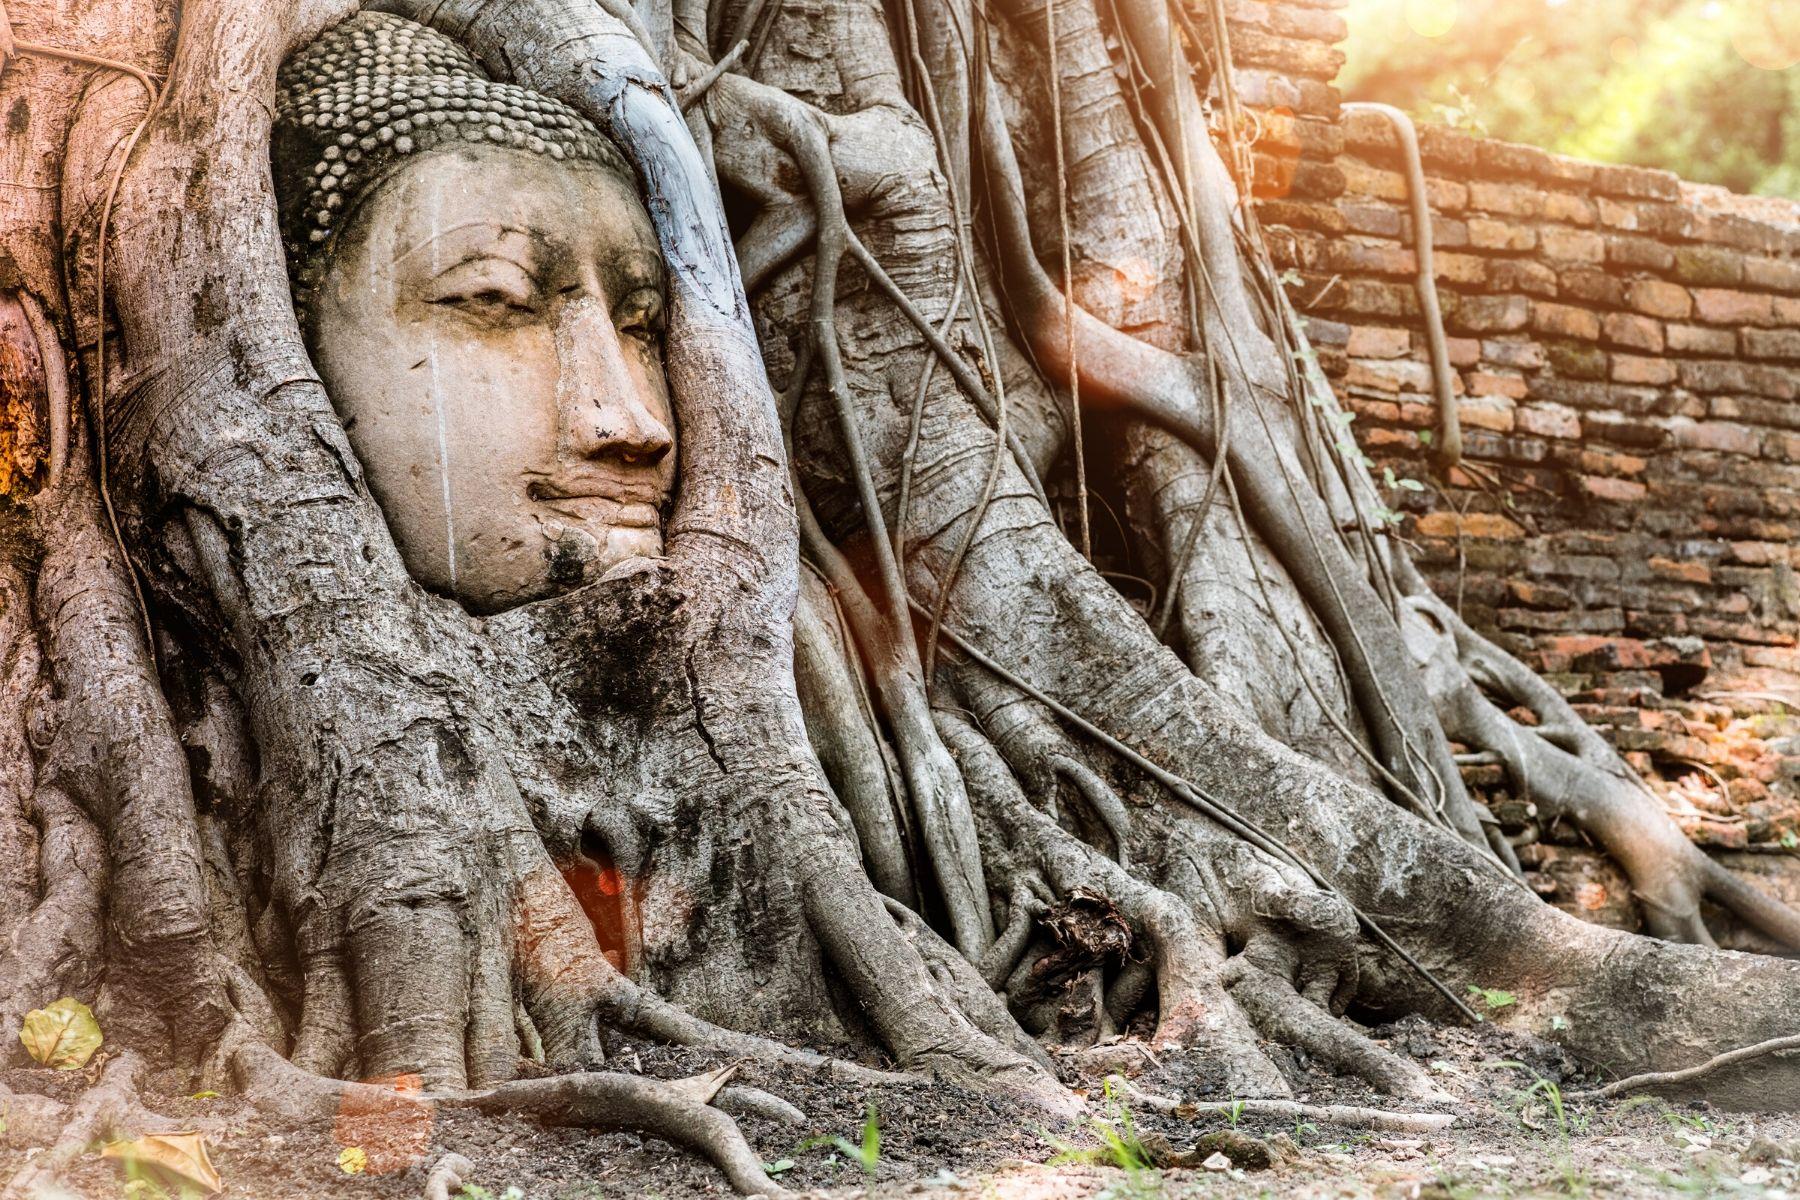 HappyFresh_One_Day_Trip_Near_Bangkok_Head_of_Bhuddha_Statue